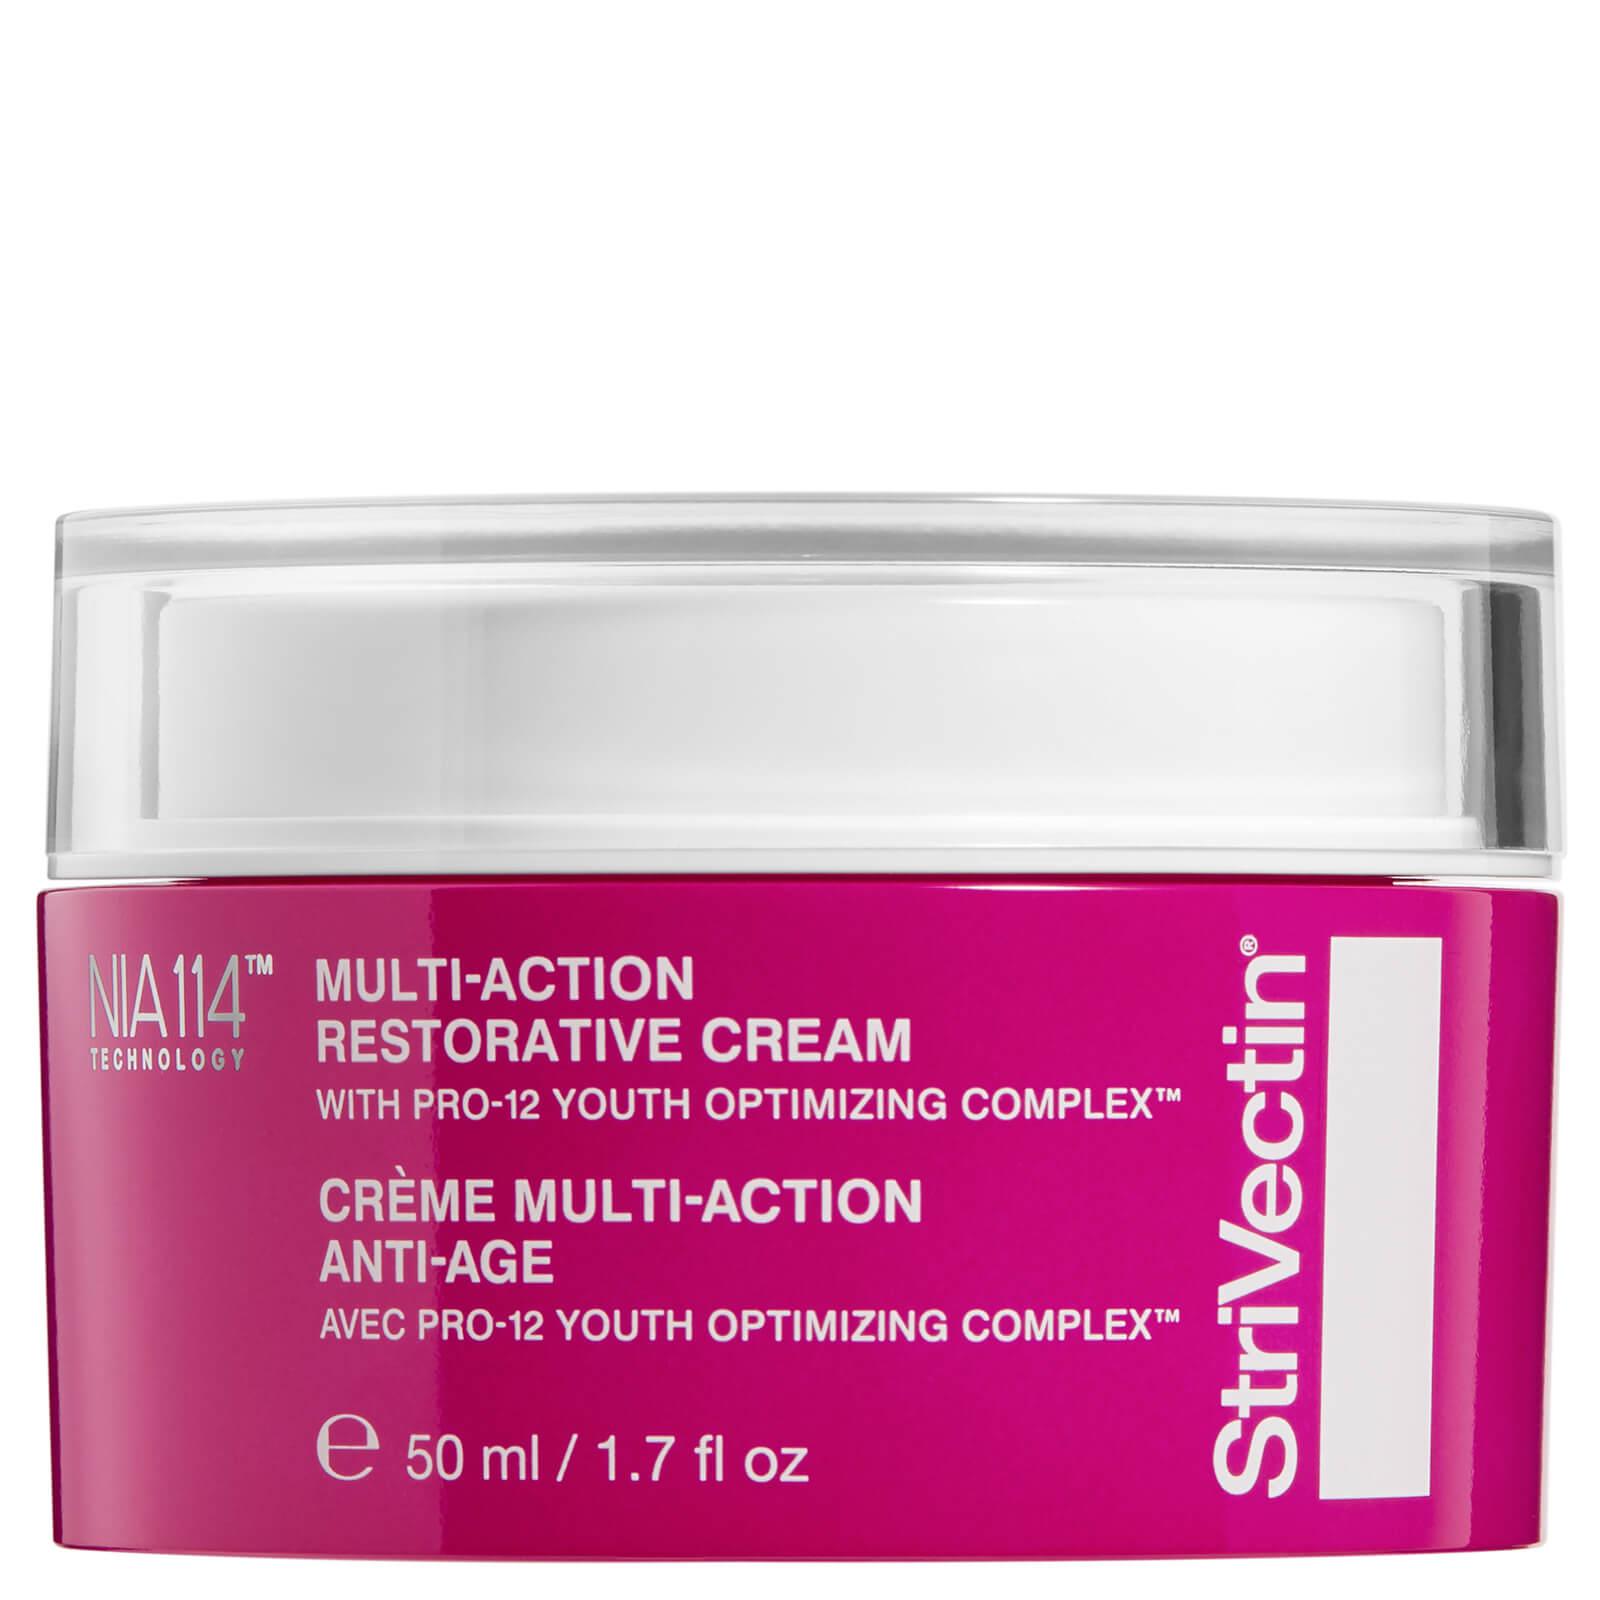 StriVectin Multi-Action Restorative Cream 50ml   BeautyExpert